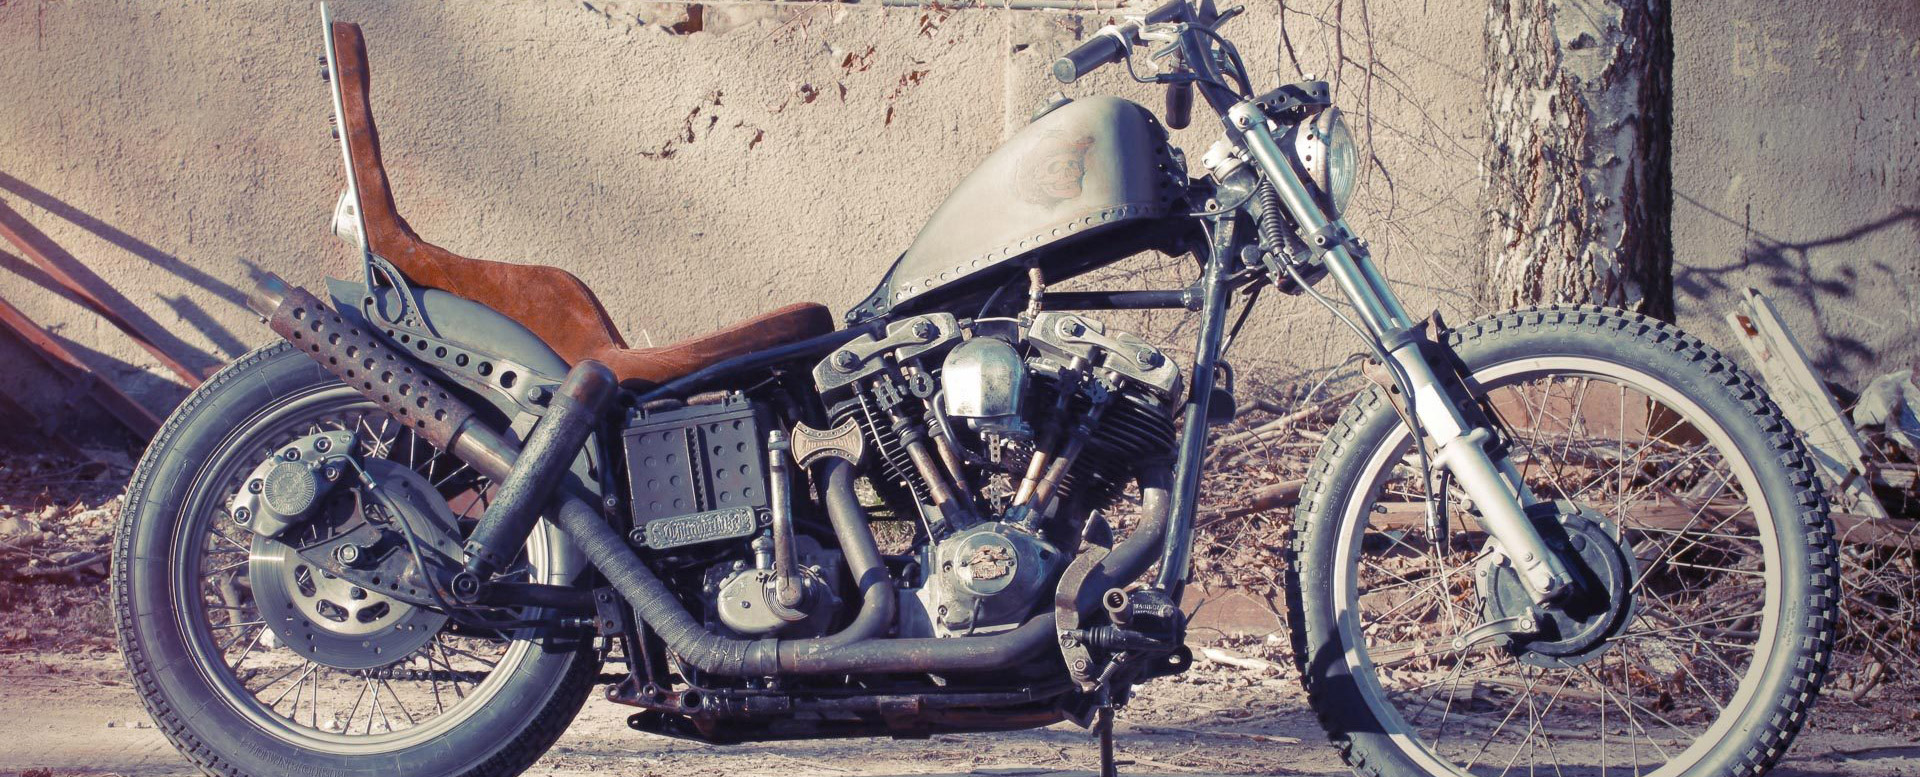 Harley Davidson® Ratbike von Thunderbike